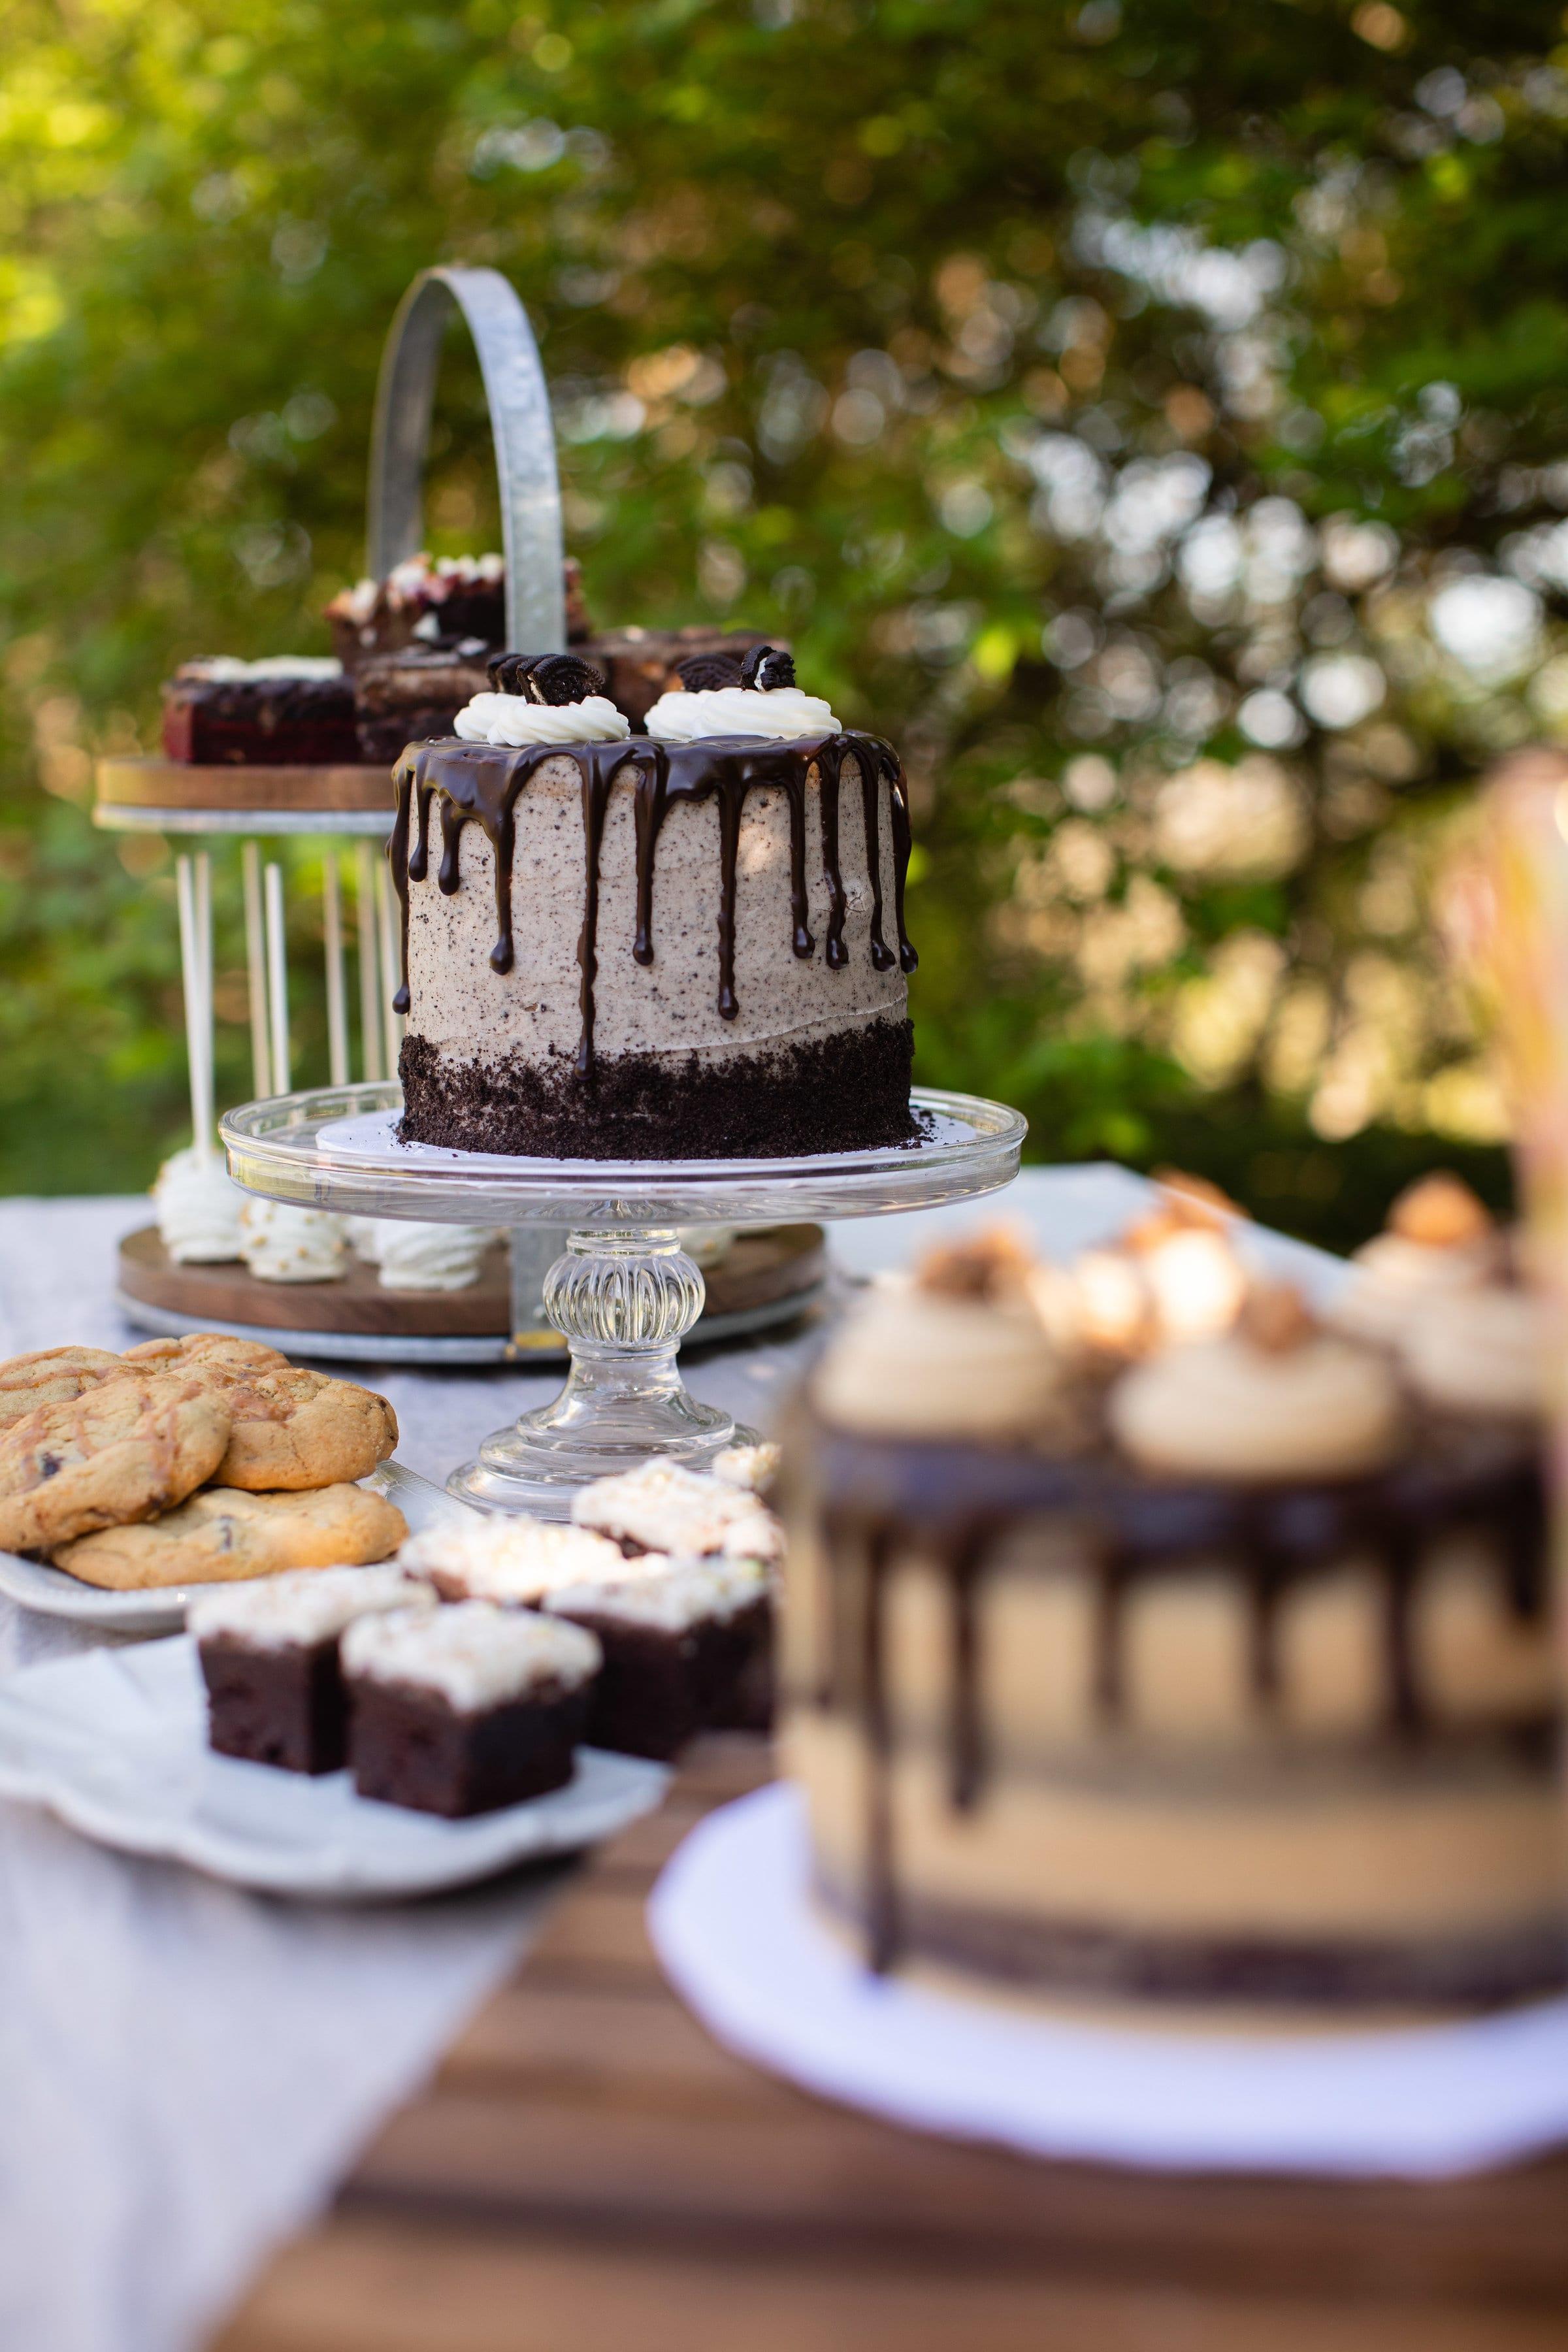 Casual Outdoor Wedding Cake Dessert Table | 3 Sweet Girls Cakery